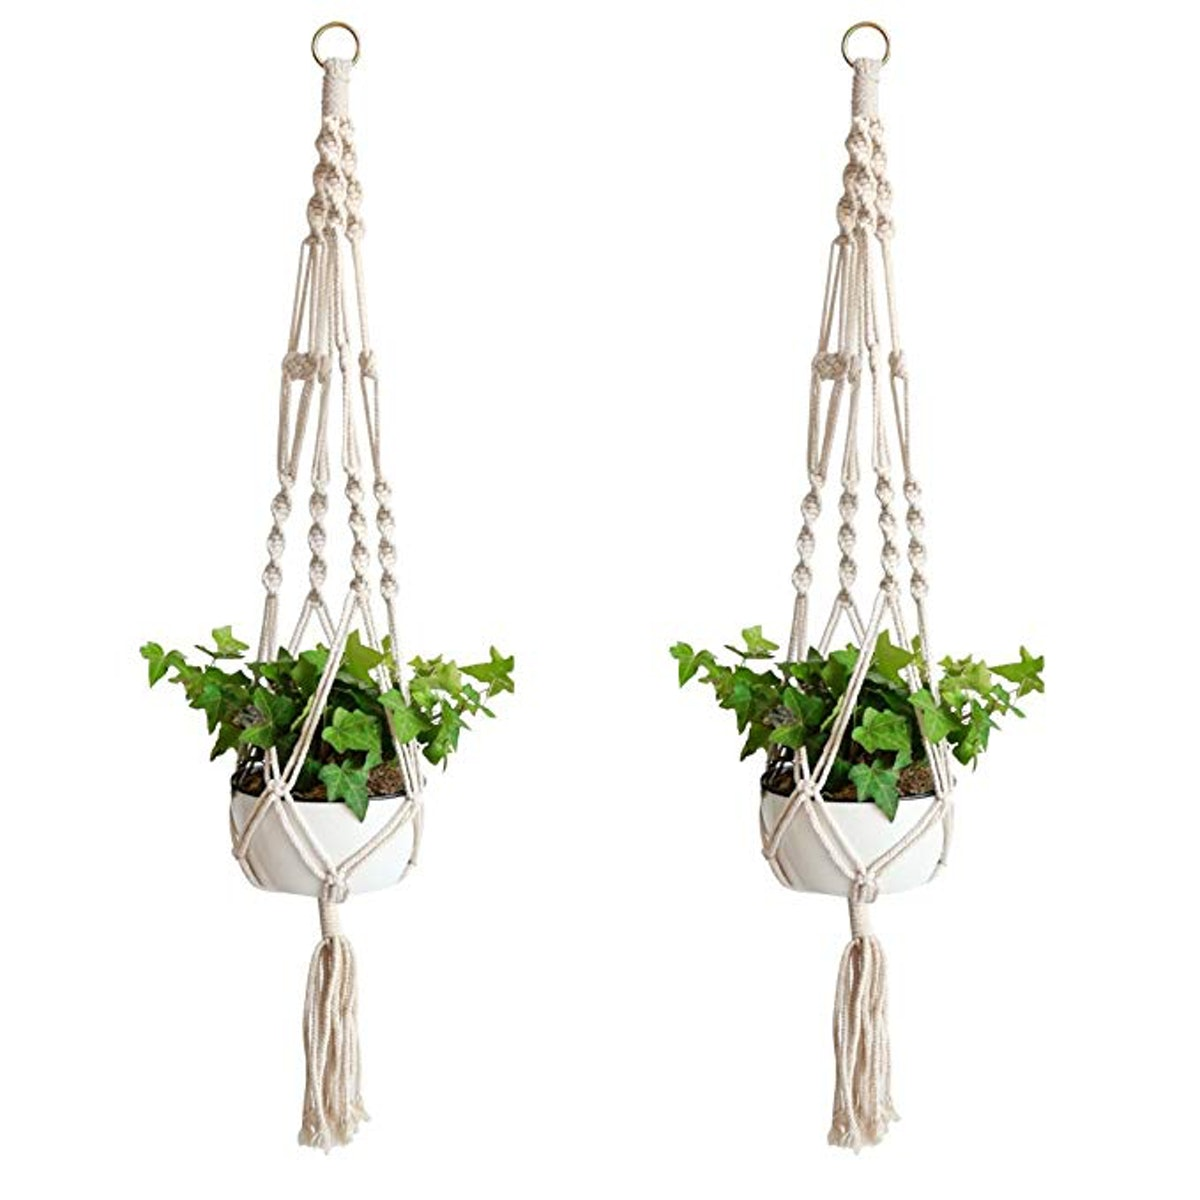 Accmor Macrame Plant Hangers (Set of 2)